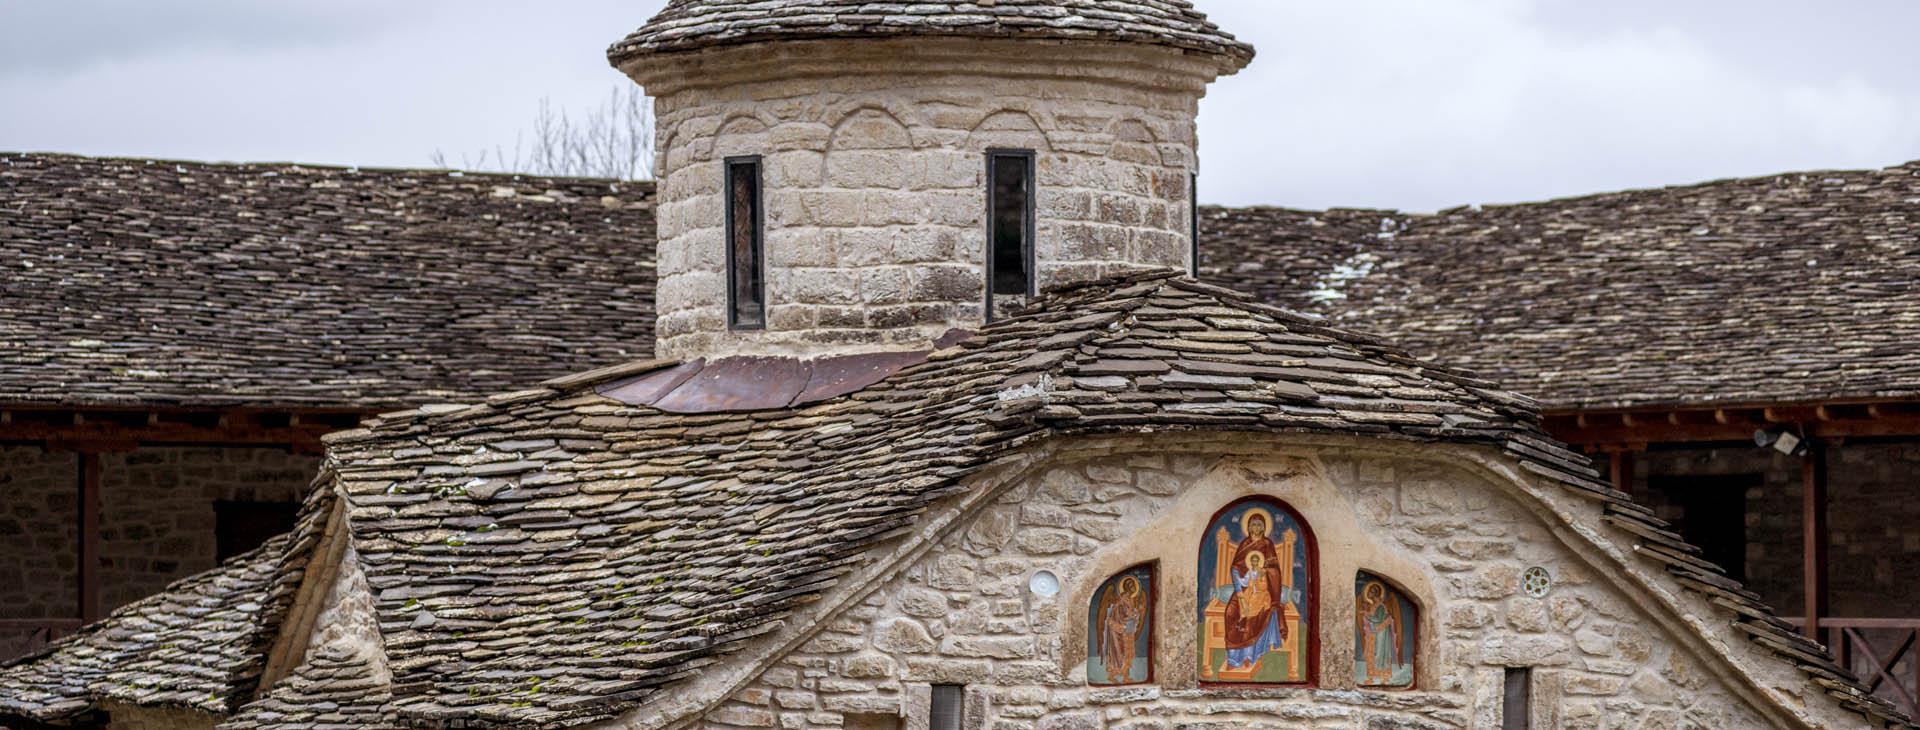 Monastery of Zoodochos Pigi of Anthohori, Ioannina